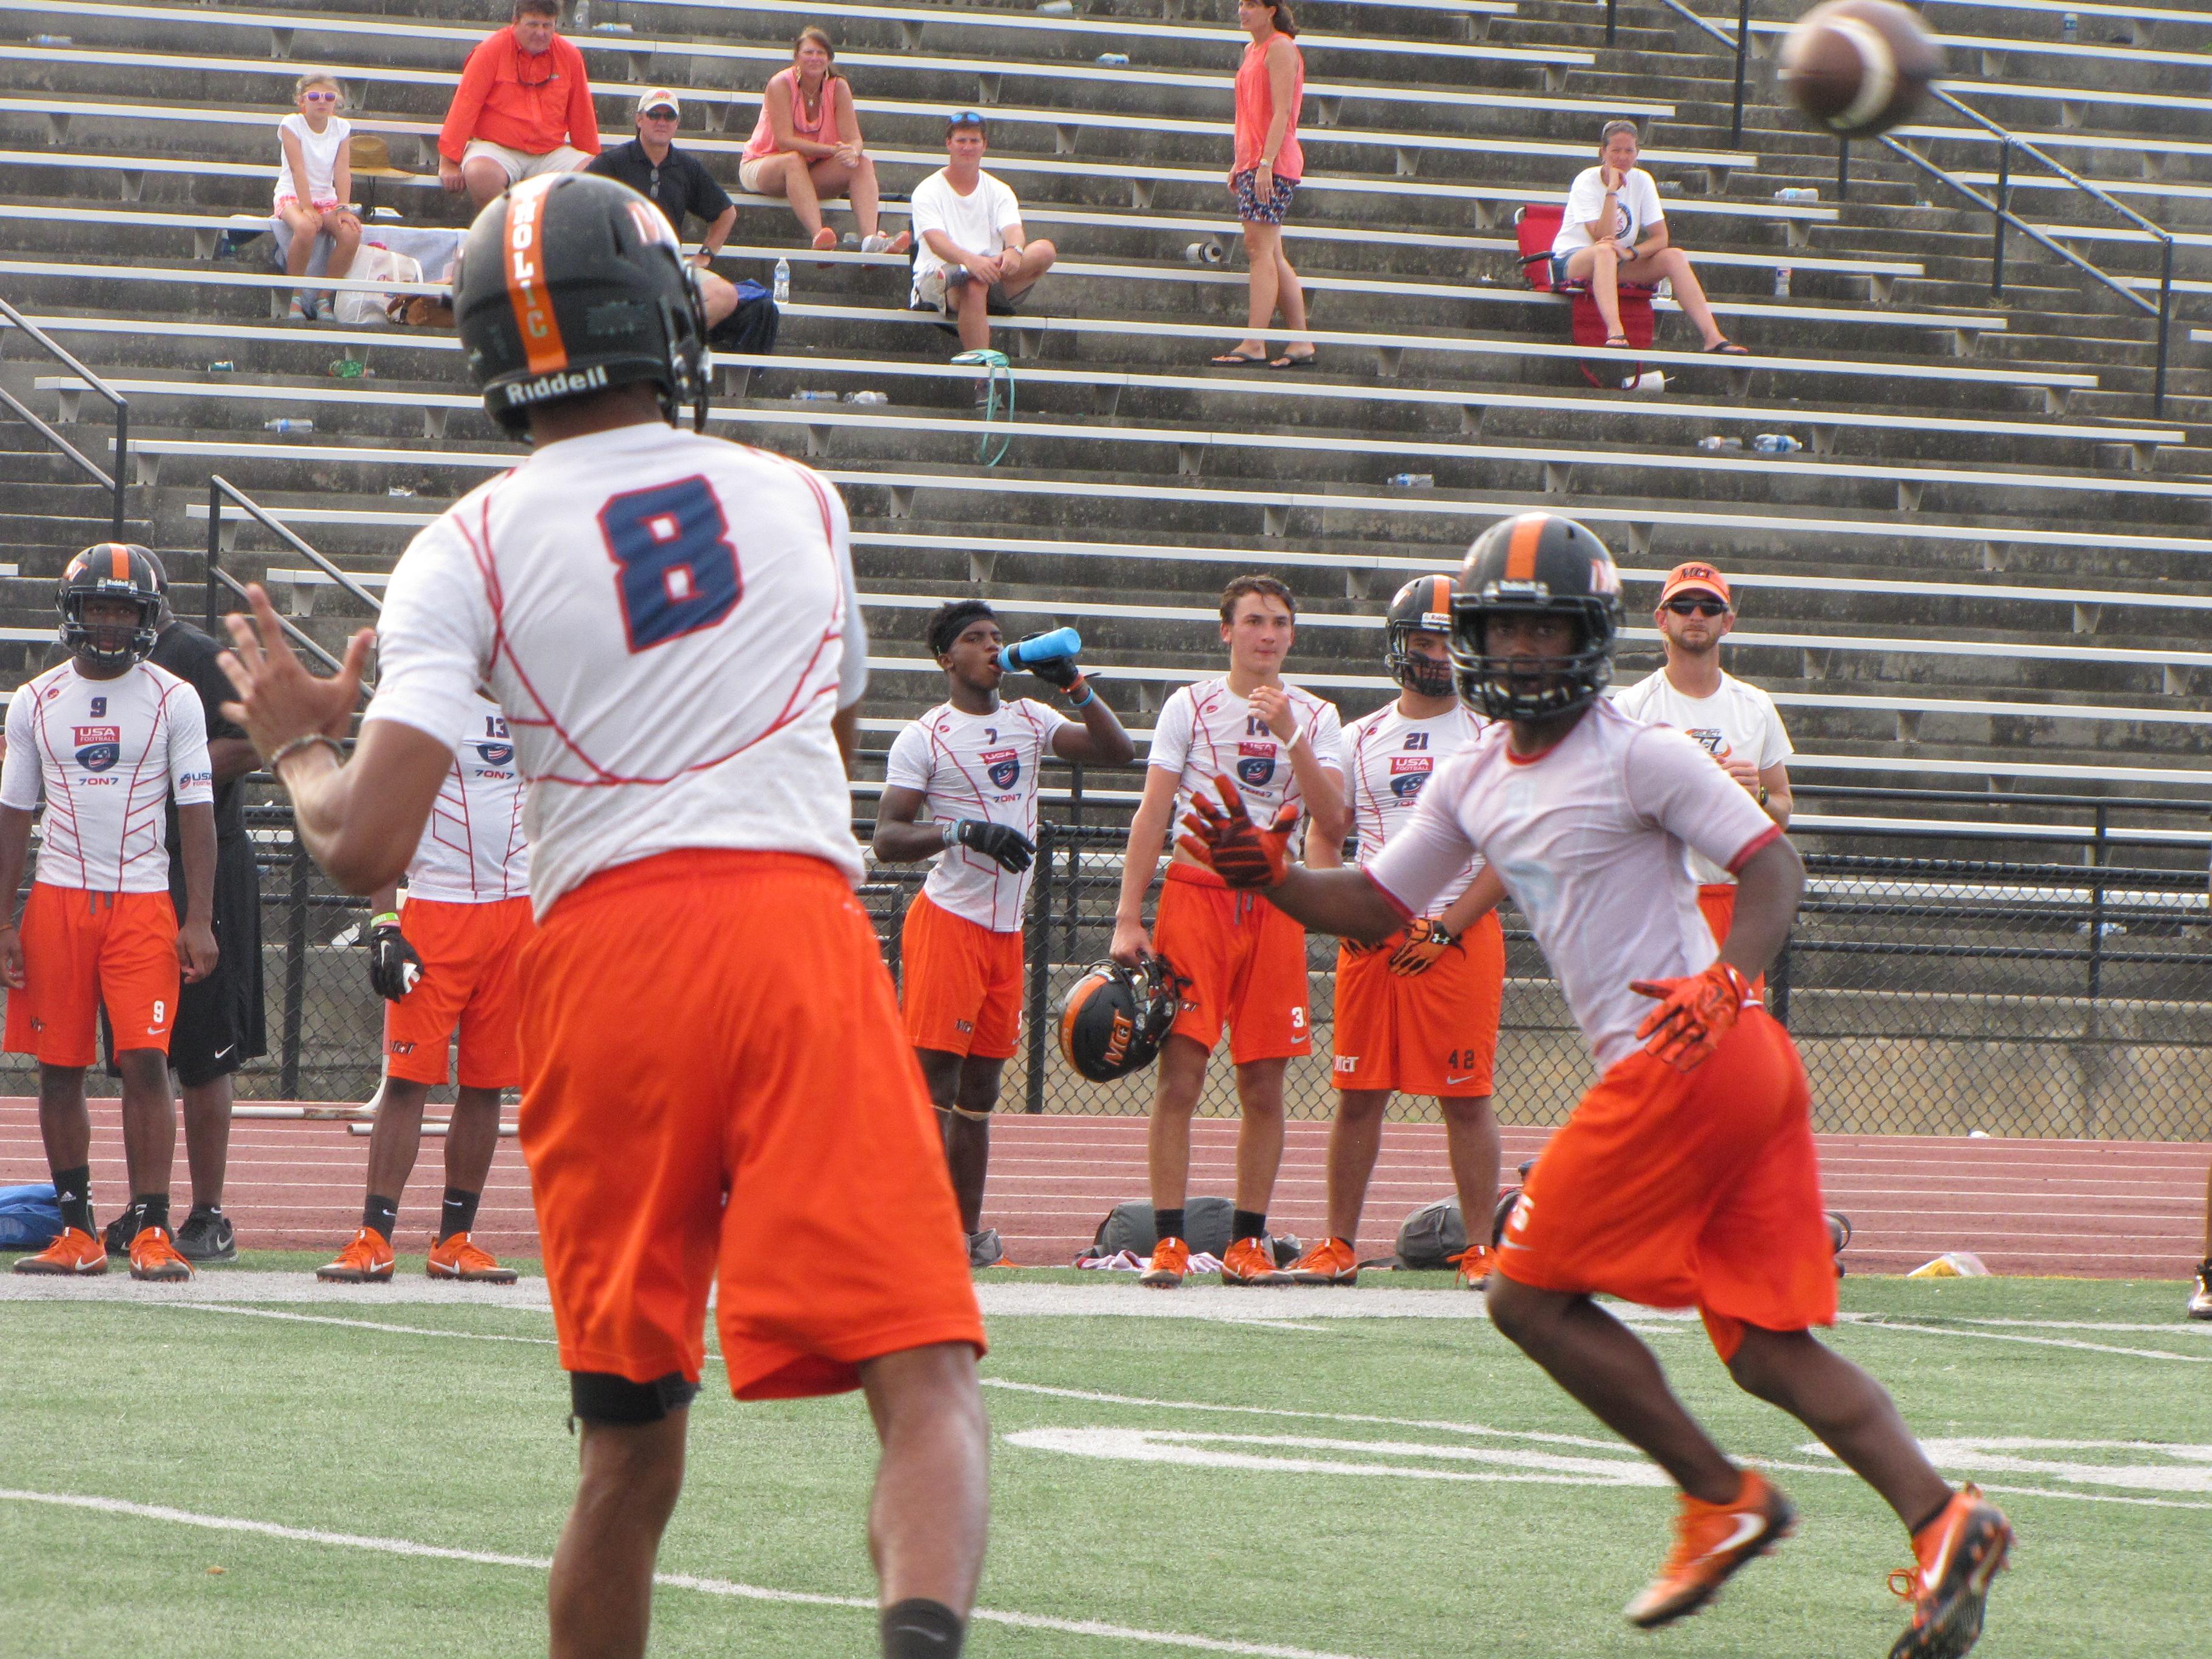 Bubba Thompson 8) takes over at quarterback Photo: Jim Halley, USA TODAY Sports)